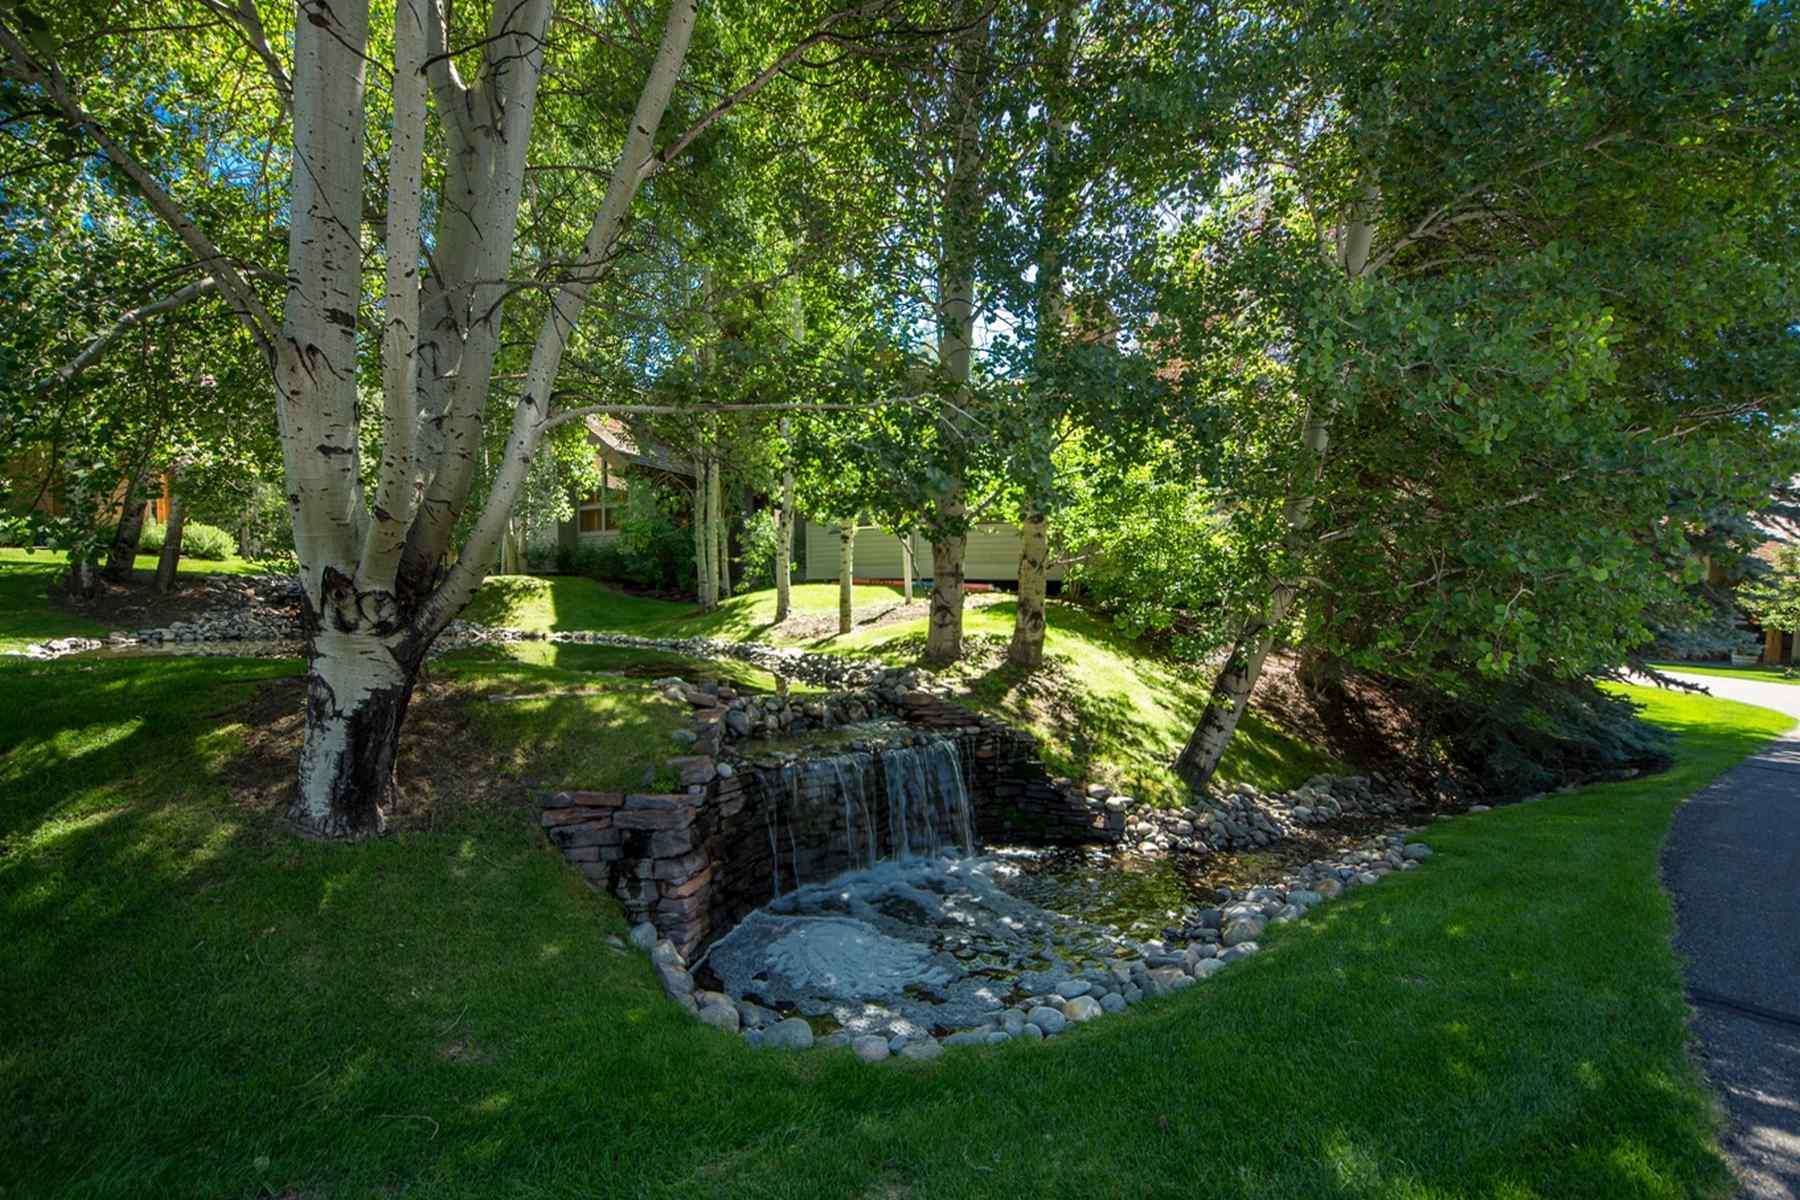 Additional photo for property listing at Best of Weyyakin 302 Weyyakin Drive Sun Valley, Idaho 83353 États-Unis